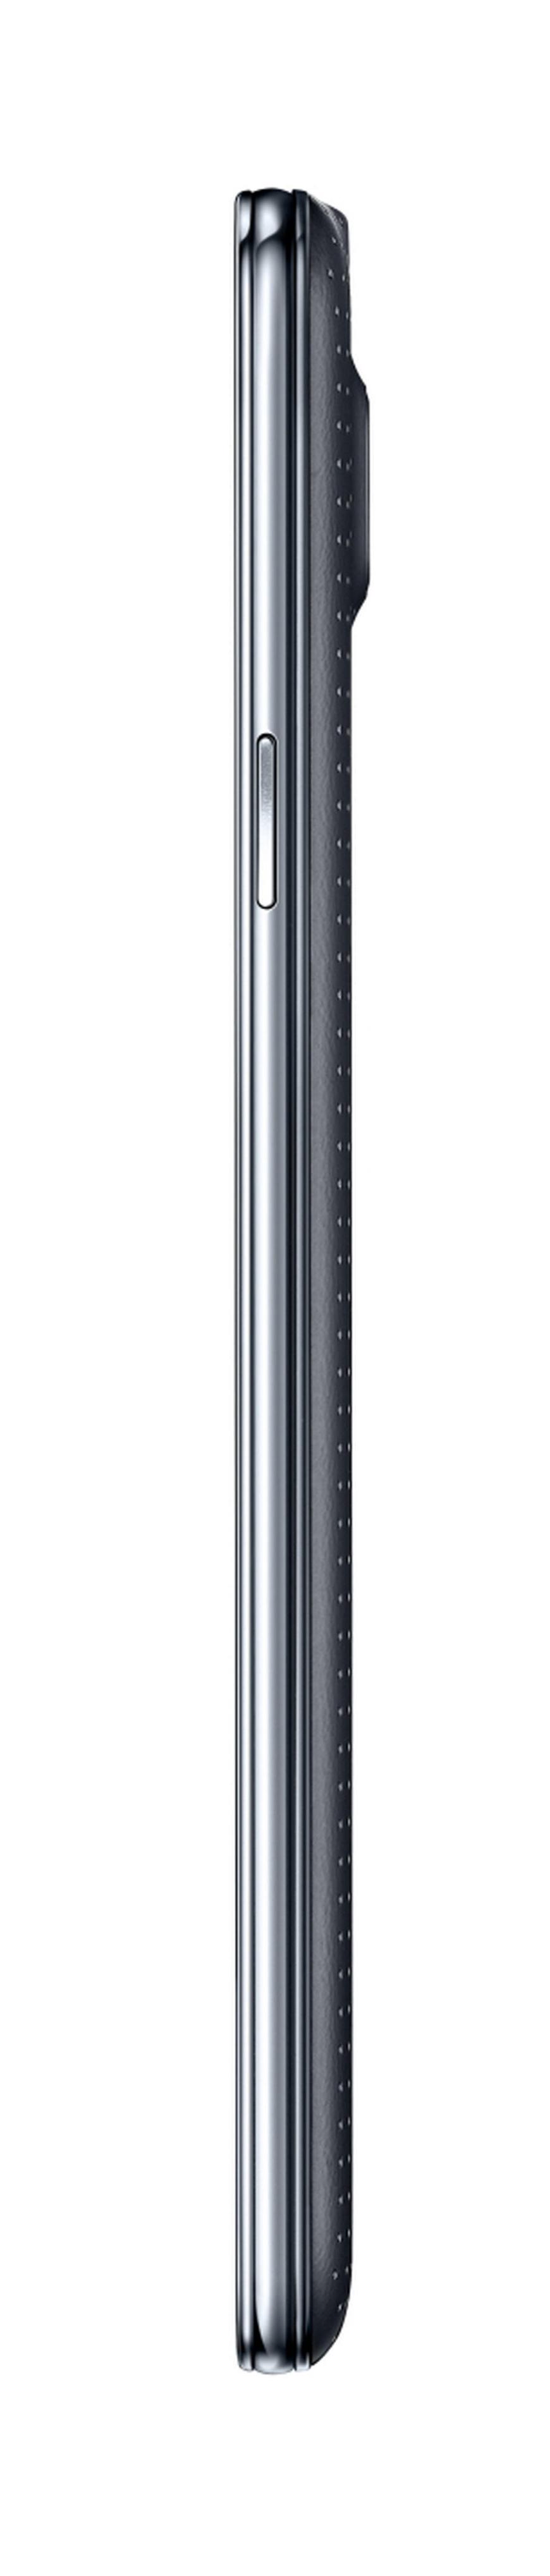 Galaxy-S5-press-image-6